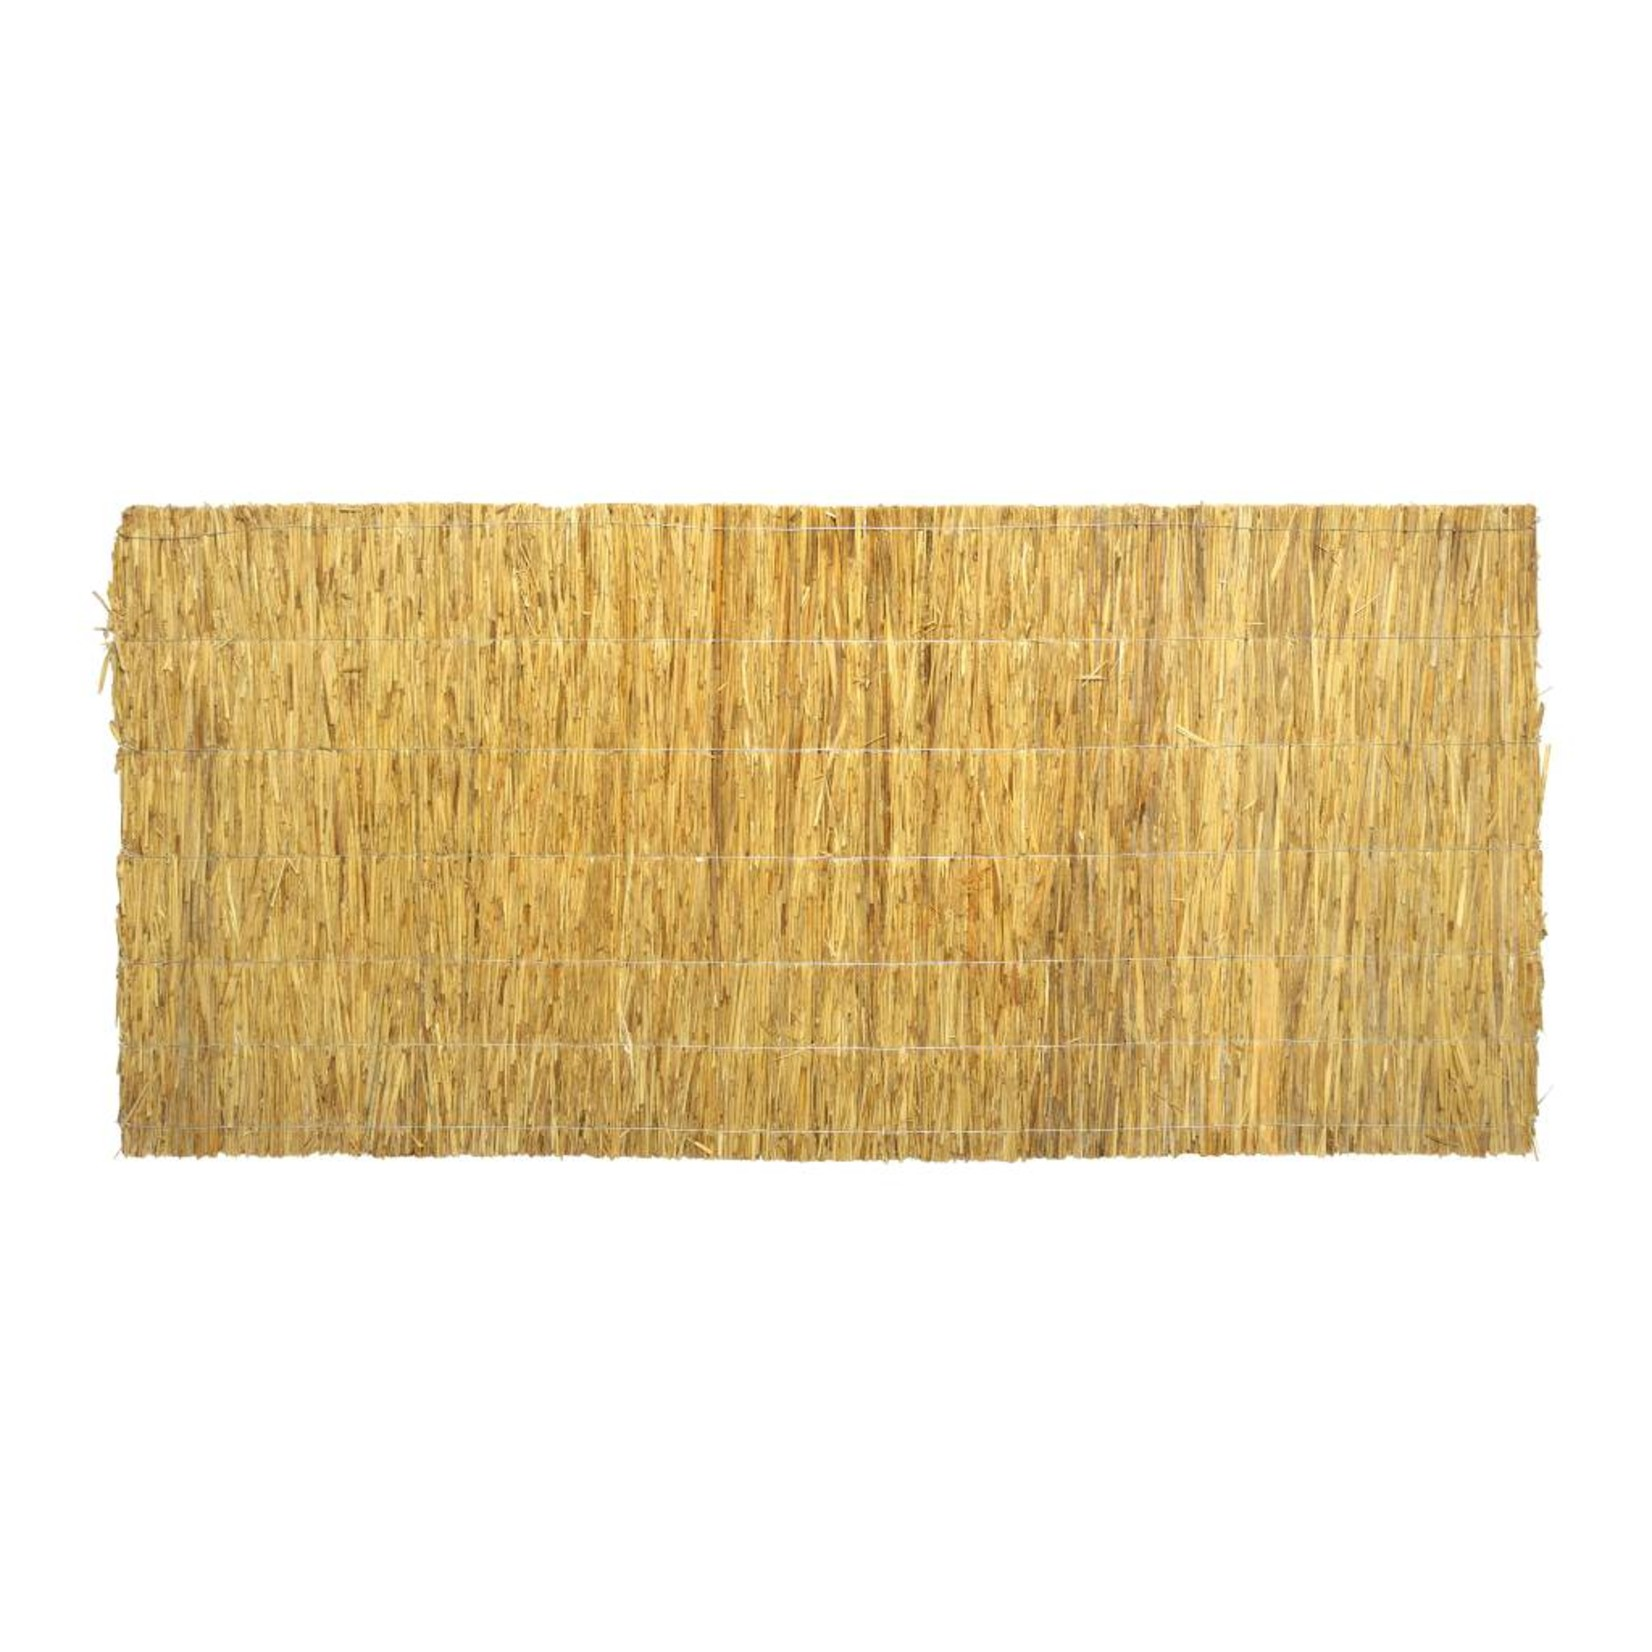 TuinChamp Rietplaat 3 cm dik 100 x 200 cm